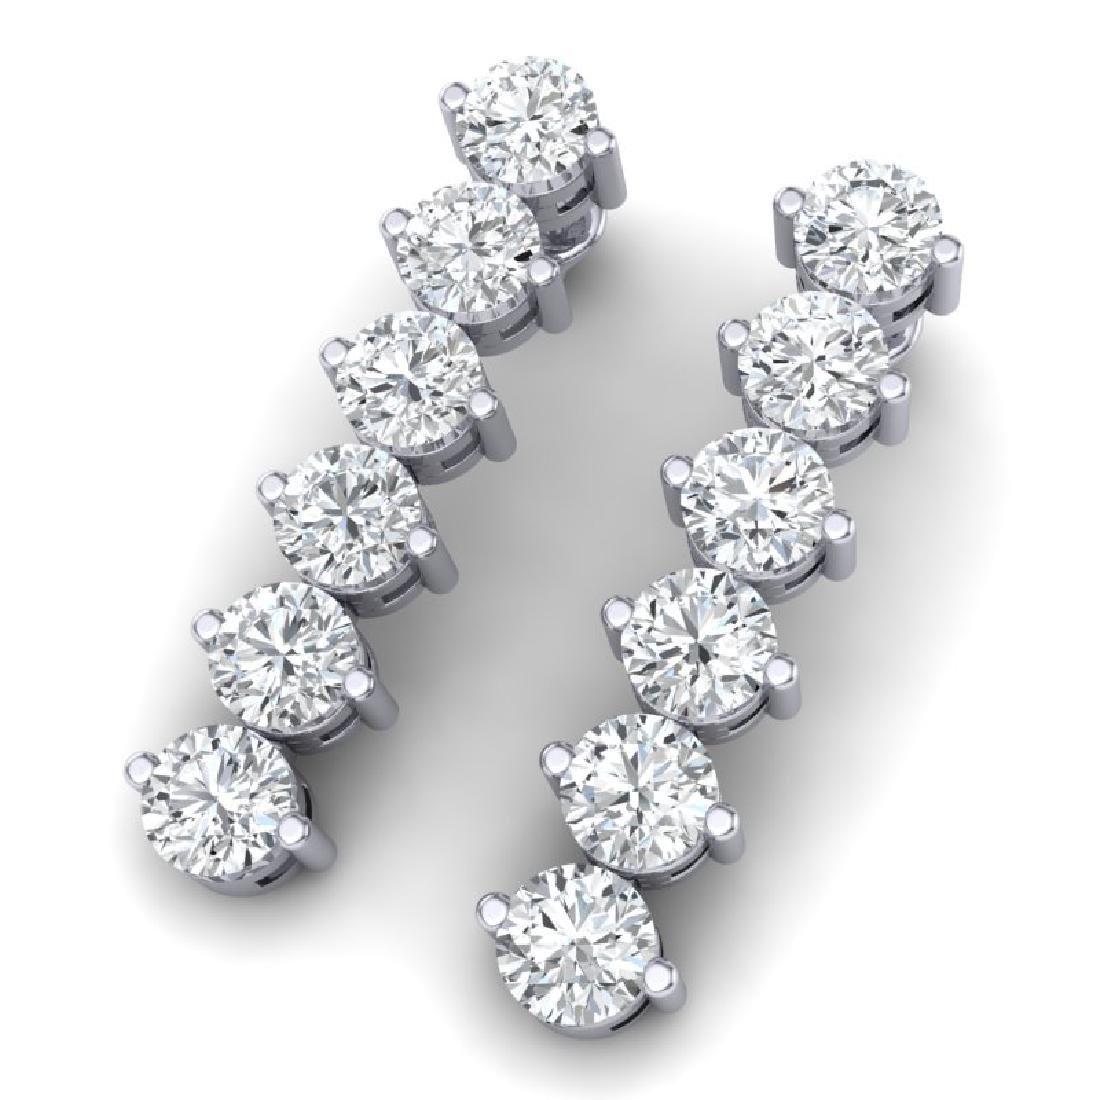 6 CTW Certified SI/I Diamond Earrings 18K White Gold